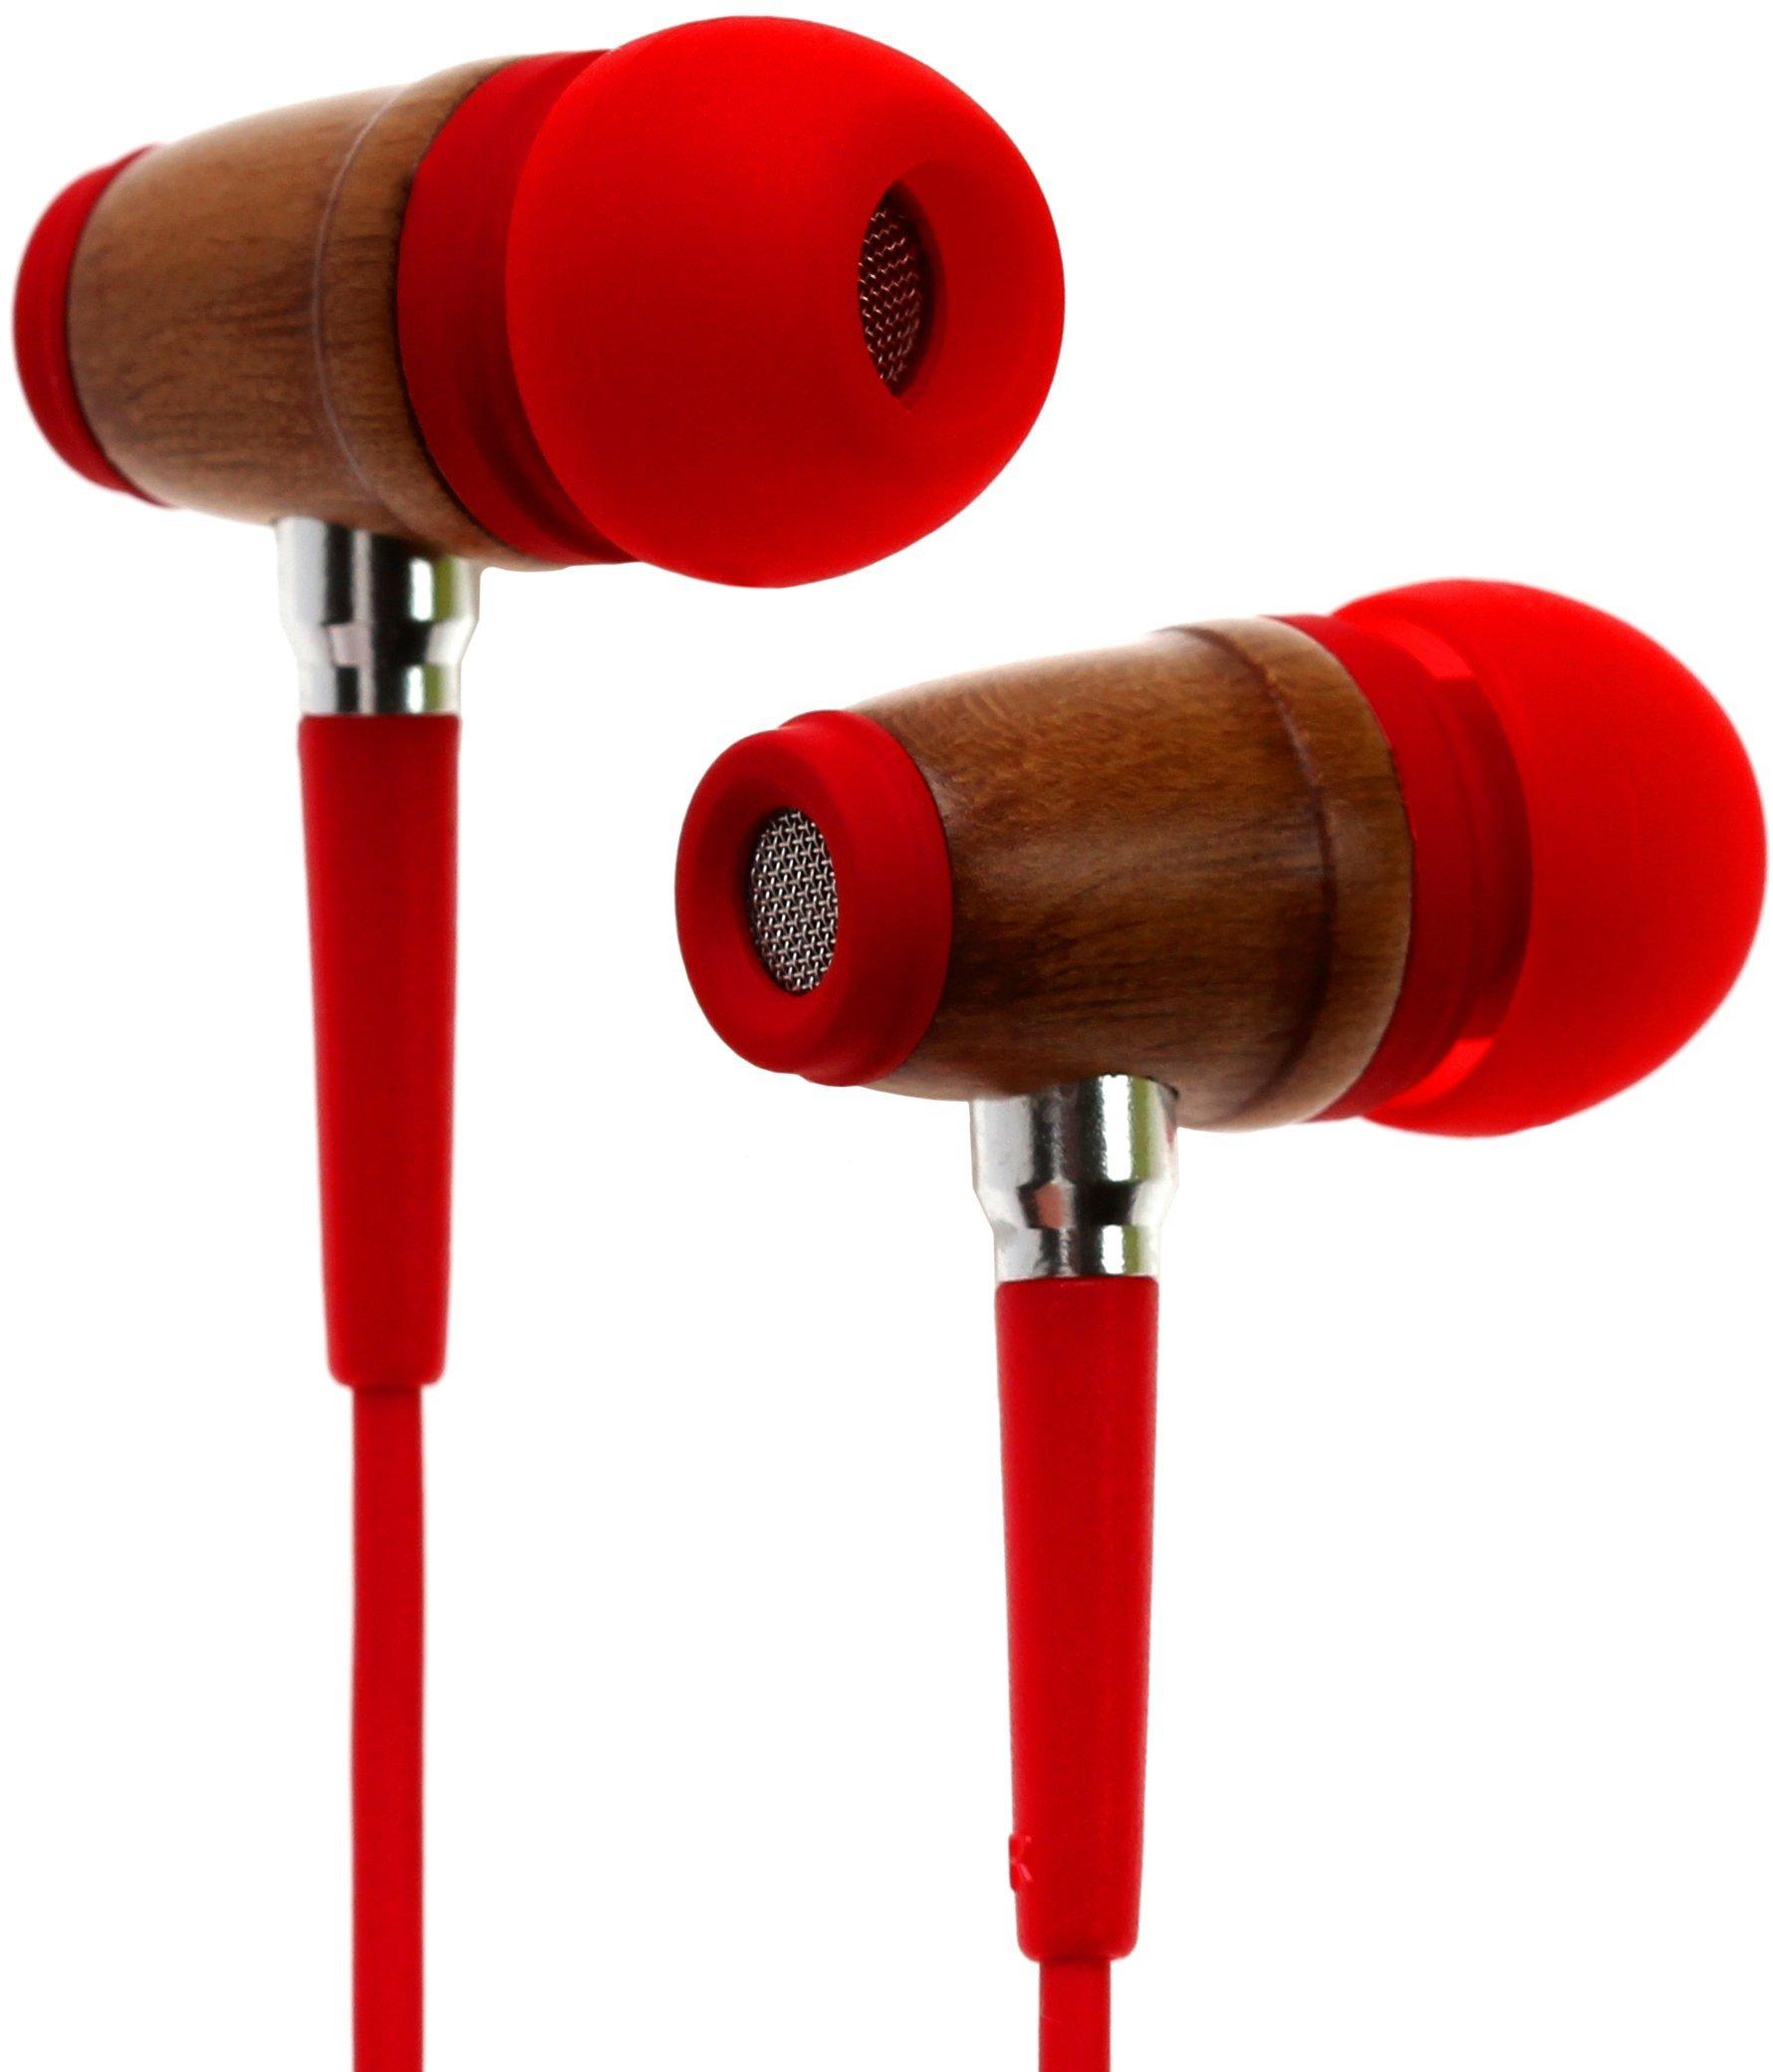 Symphonized Kids Volume Limited Premium Wood Auriculares con aislamiento de ruido on-ear   Auriculares   Auriculares con